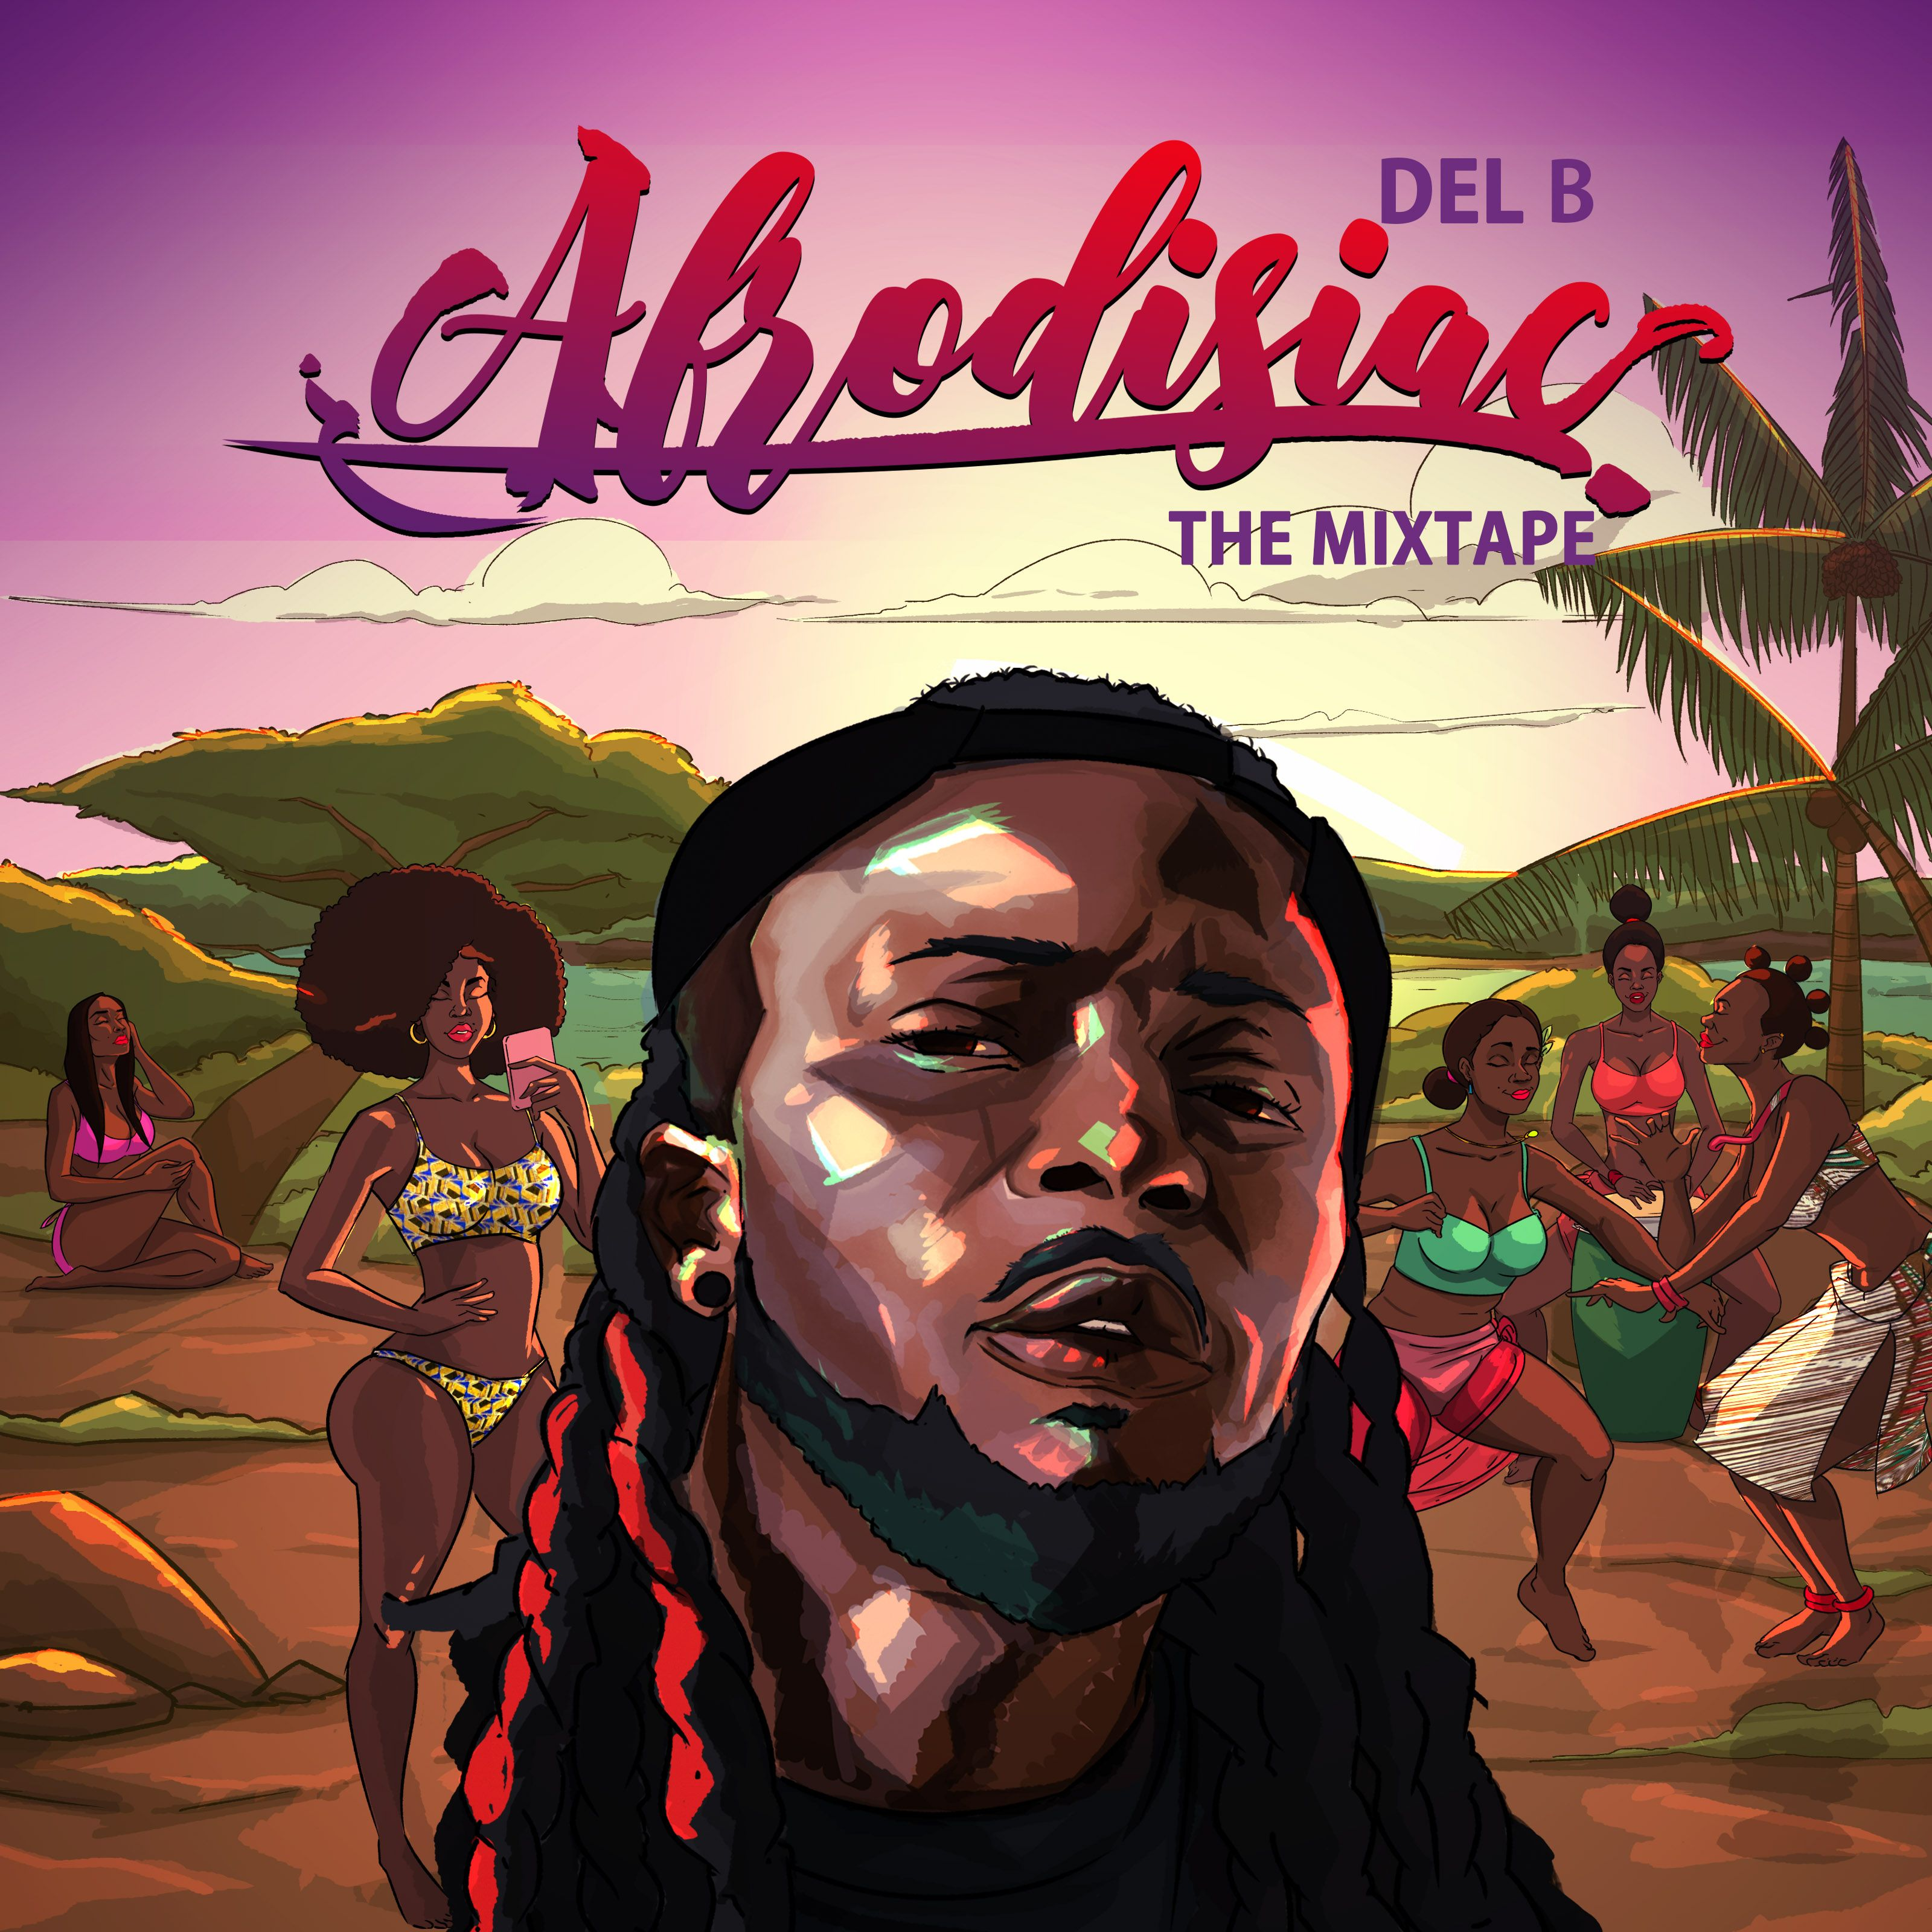 Del B releases debut project Afrodisiac (the mixtape